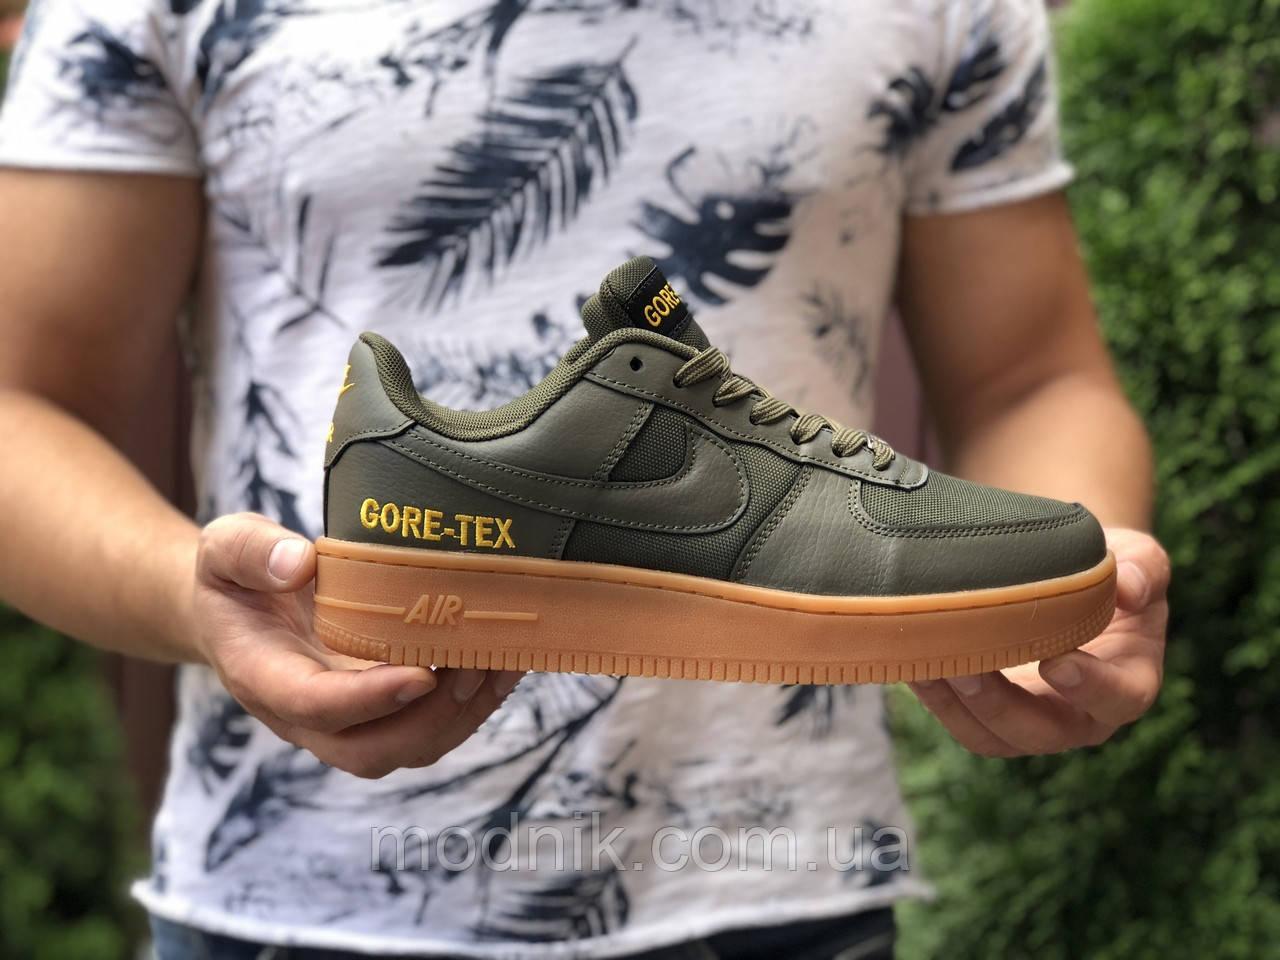 Мужские кроссовки Nike Air Force Gore-Tex (темно-зеленые) 9785